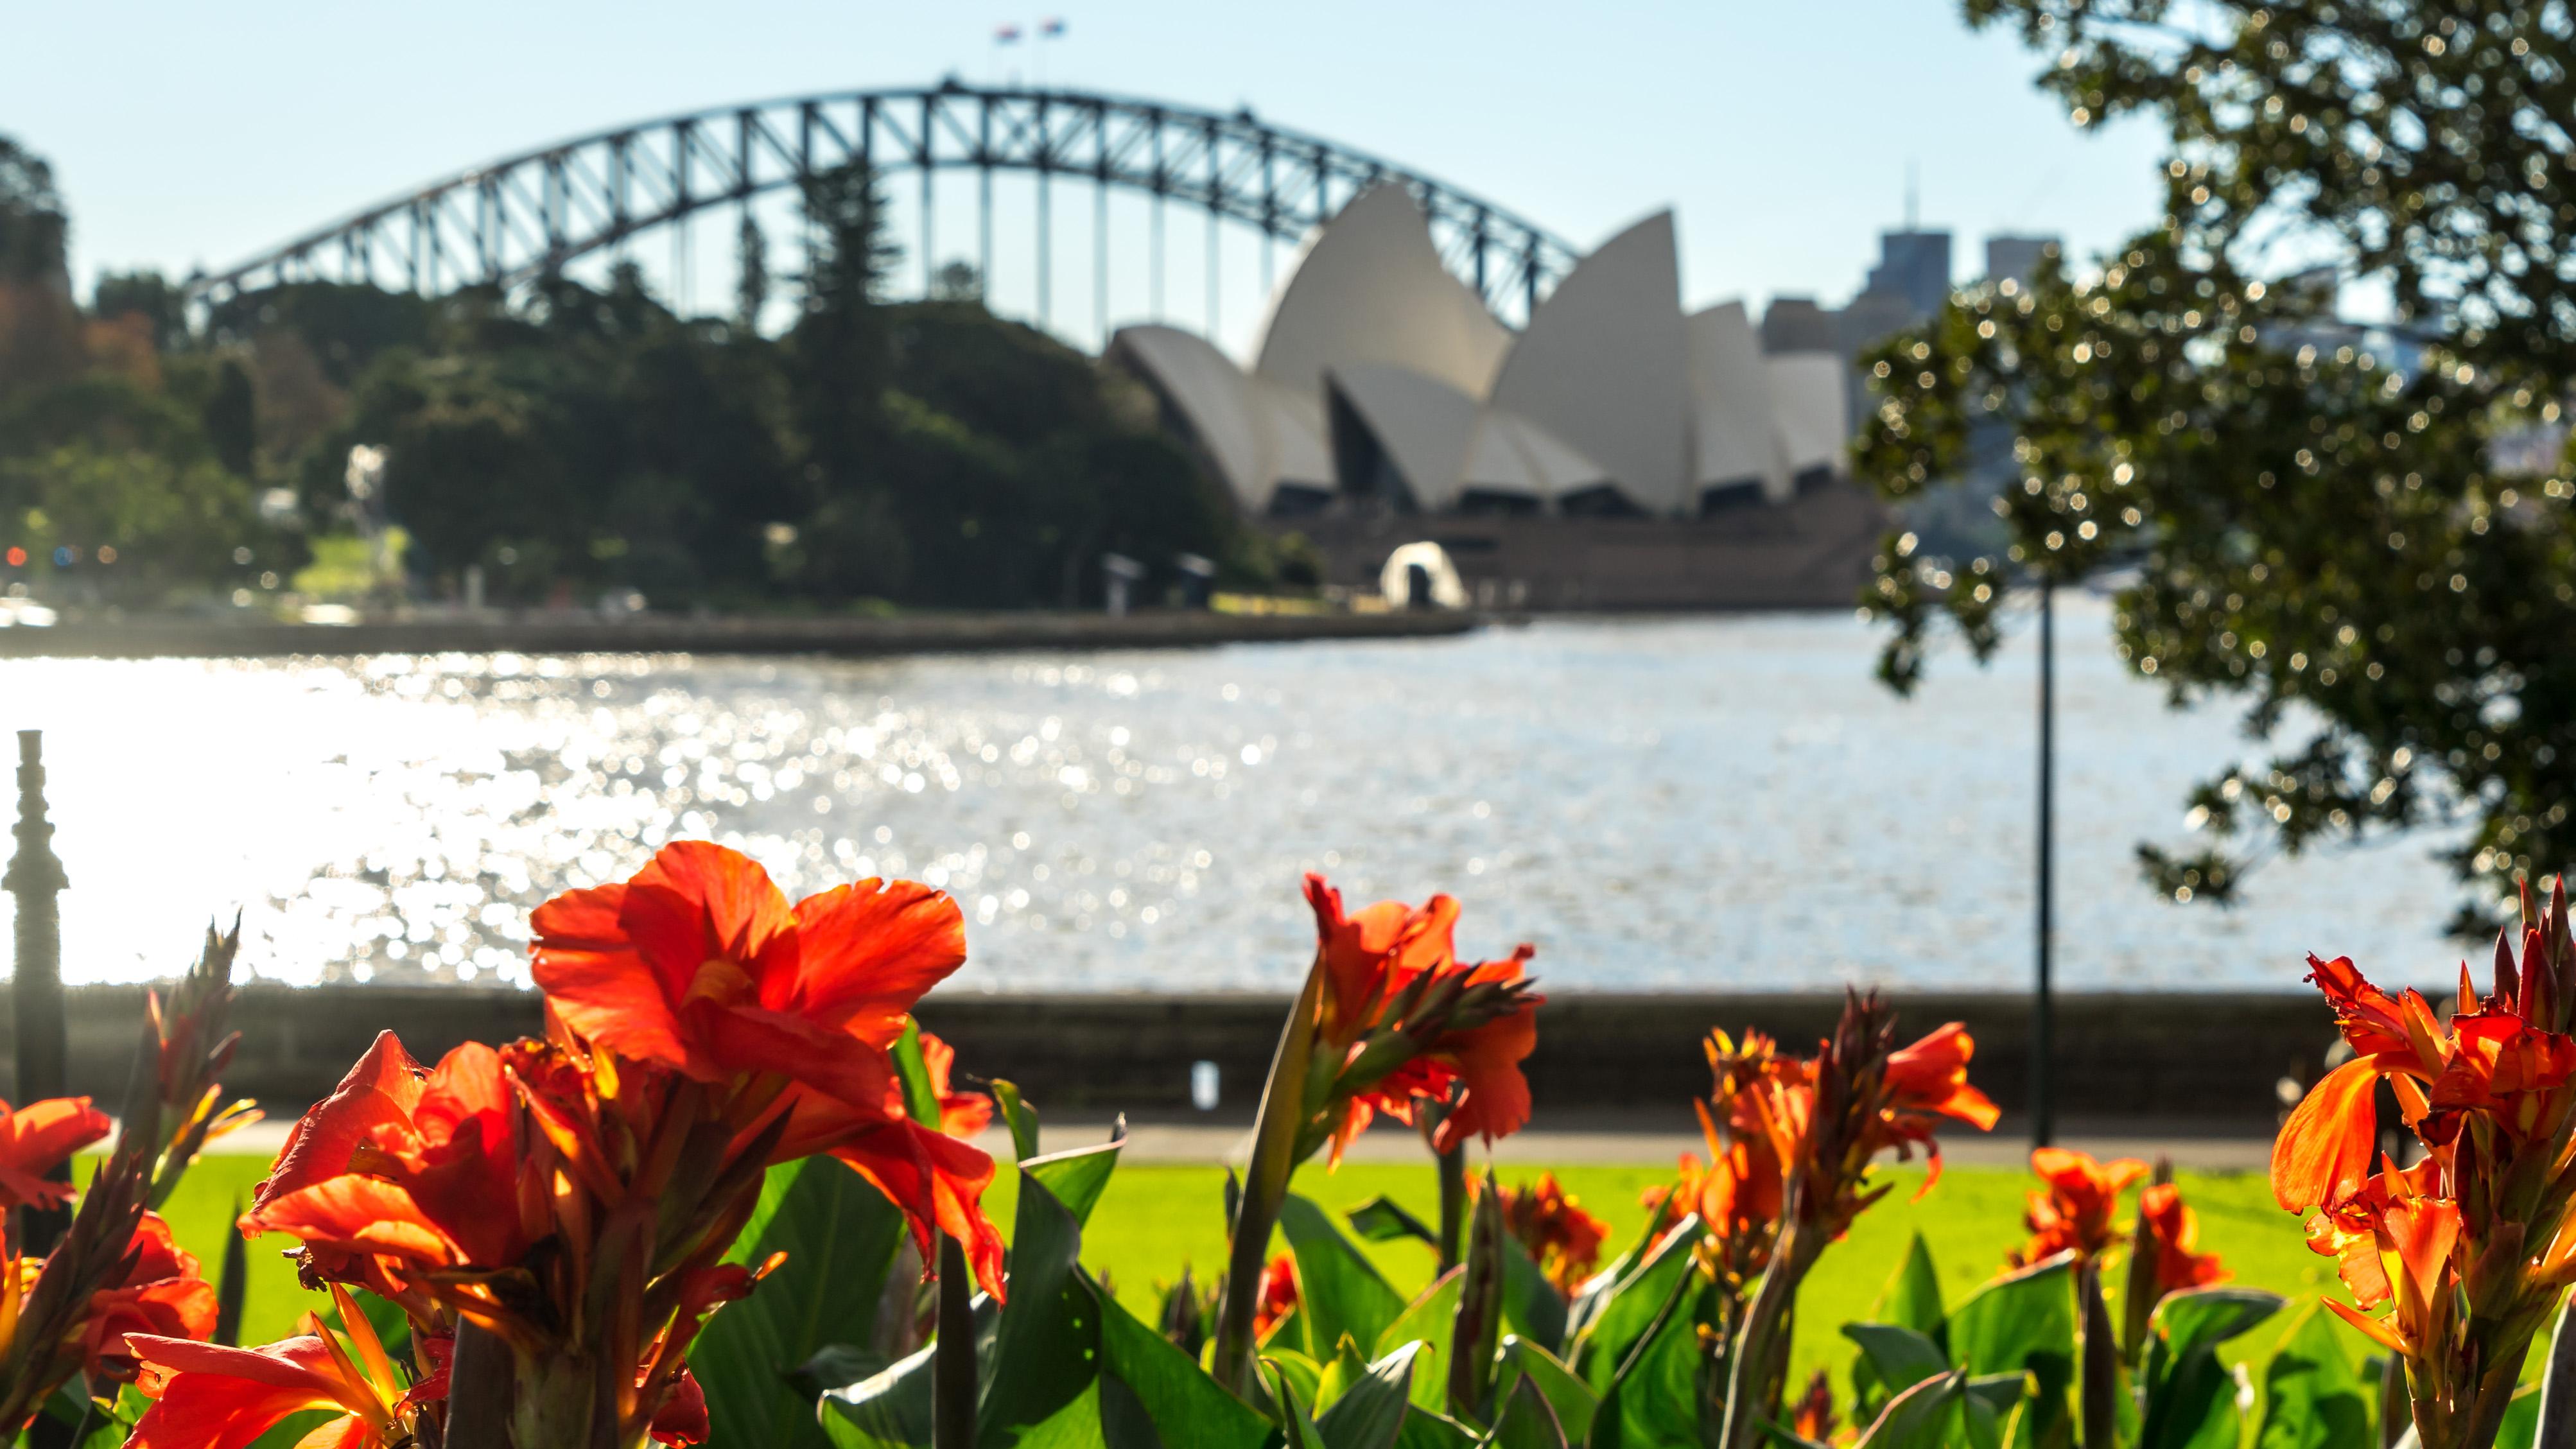 To Vivid Sydney